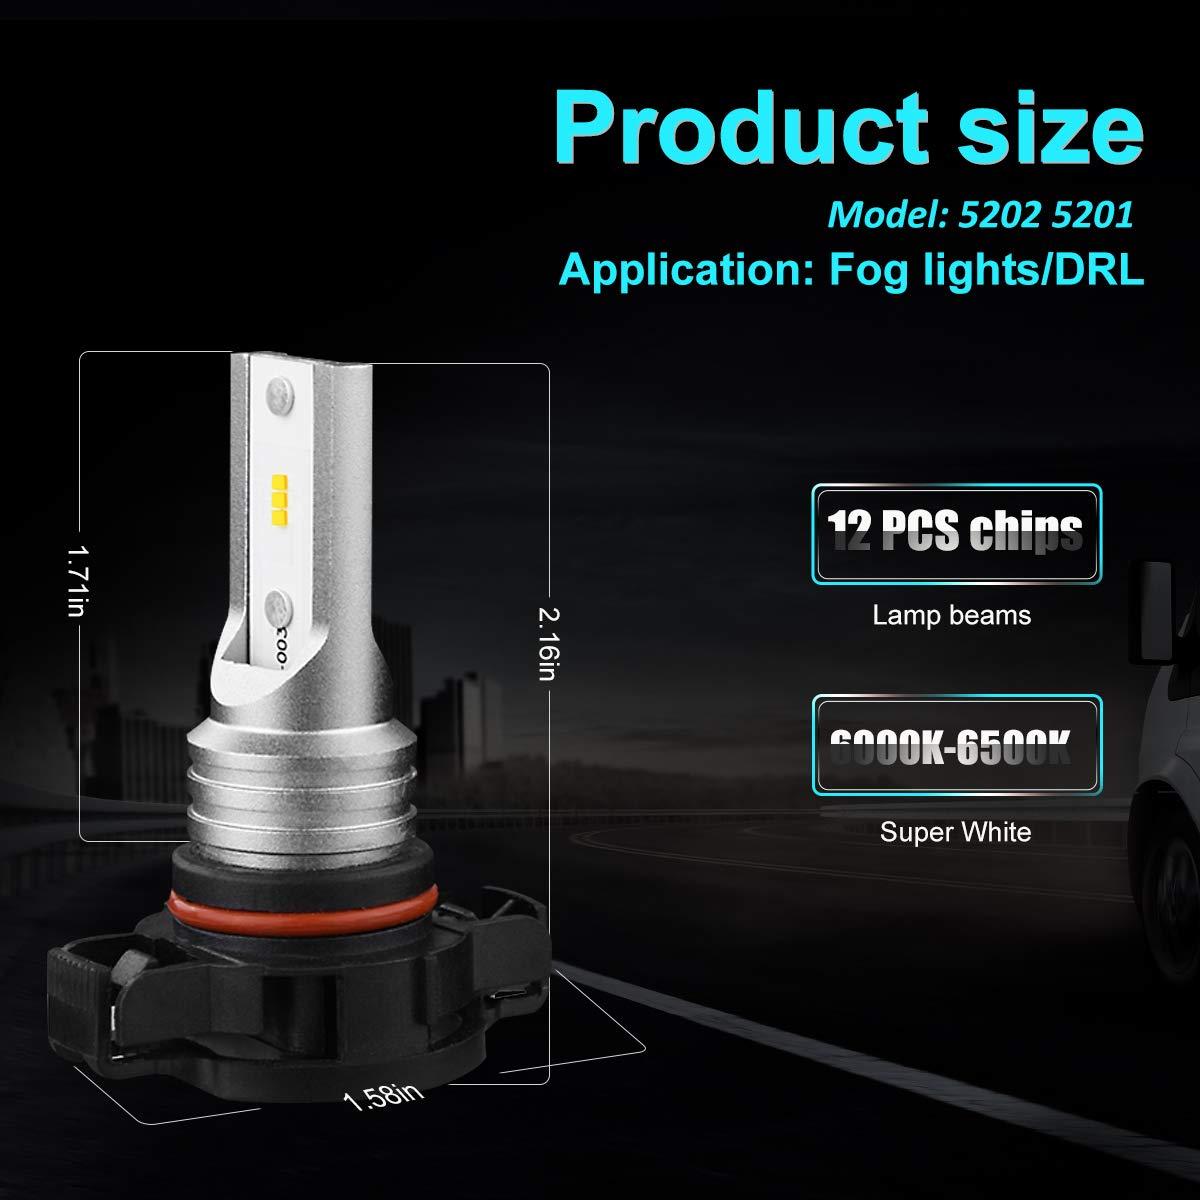 5202 5201 LED Fog Light Bulbs PS19W CSP High Power LED Fog Lamps Bulbs for DRL or Fog Lights Xenon White